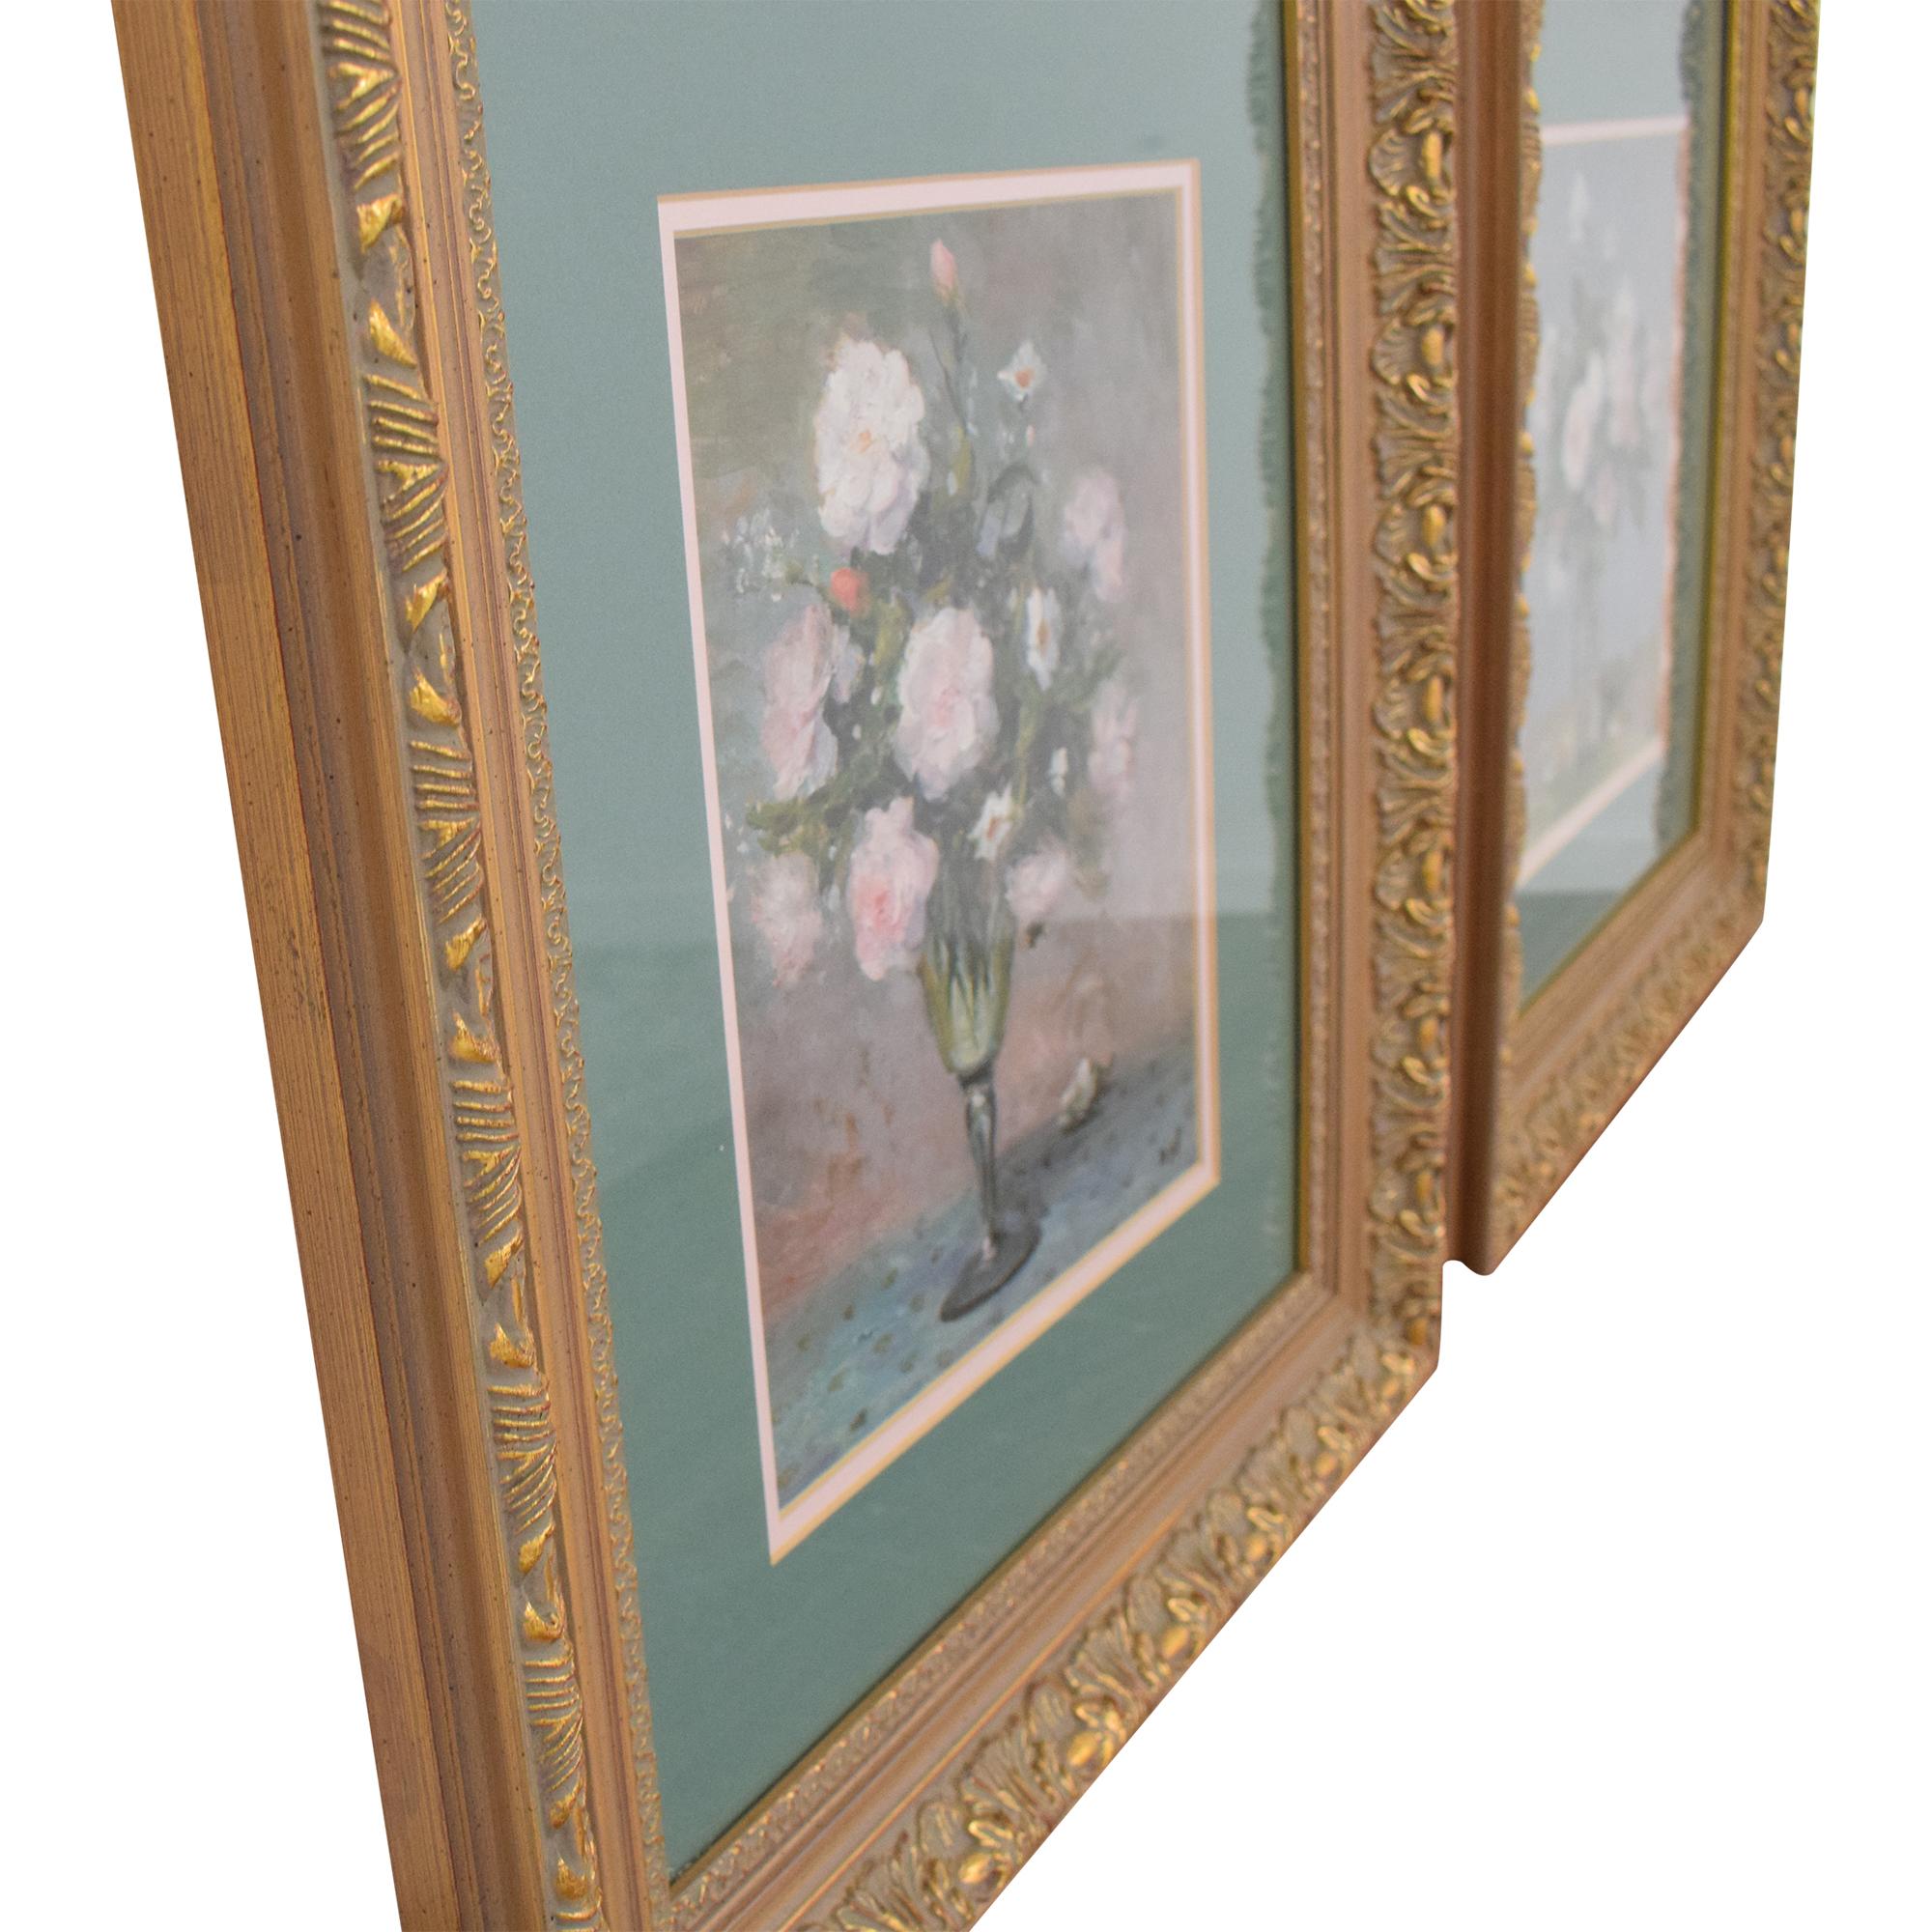 Framed Floral Wall Art second hand